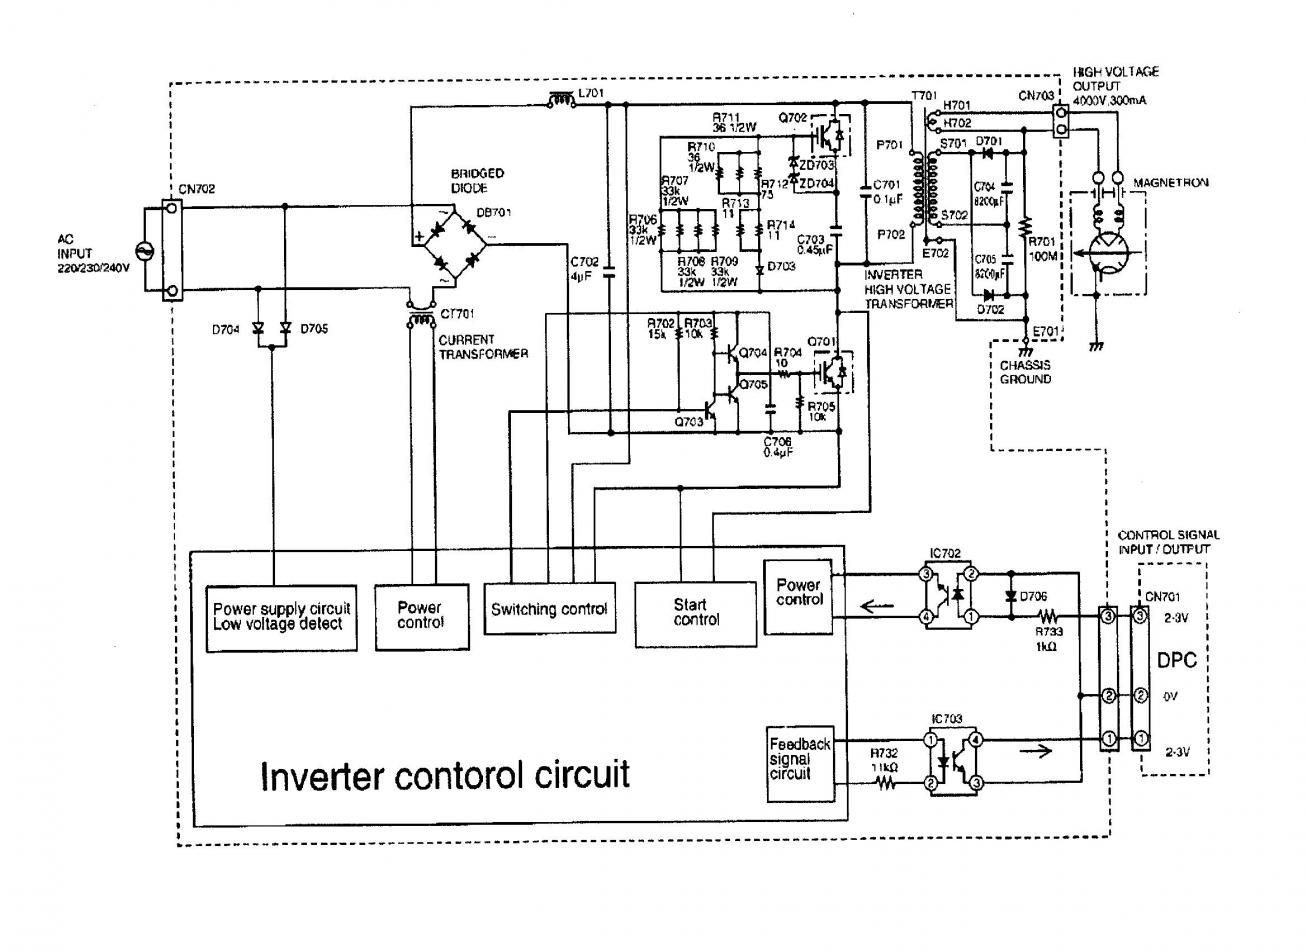 hight resolution of panasonic microwave schematic diagram wiring diagram toolbox panasonic microwave oven circuit diagram microwave oven schematic microwave